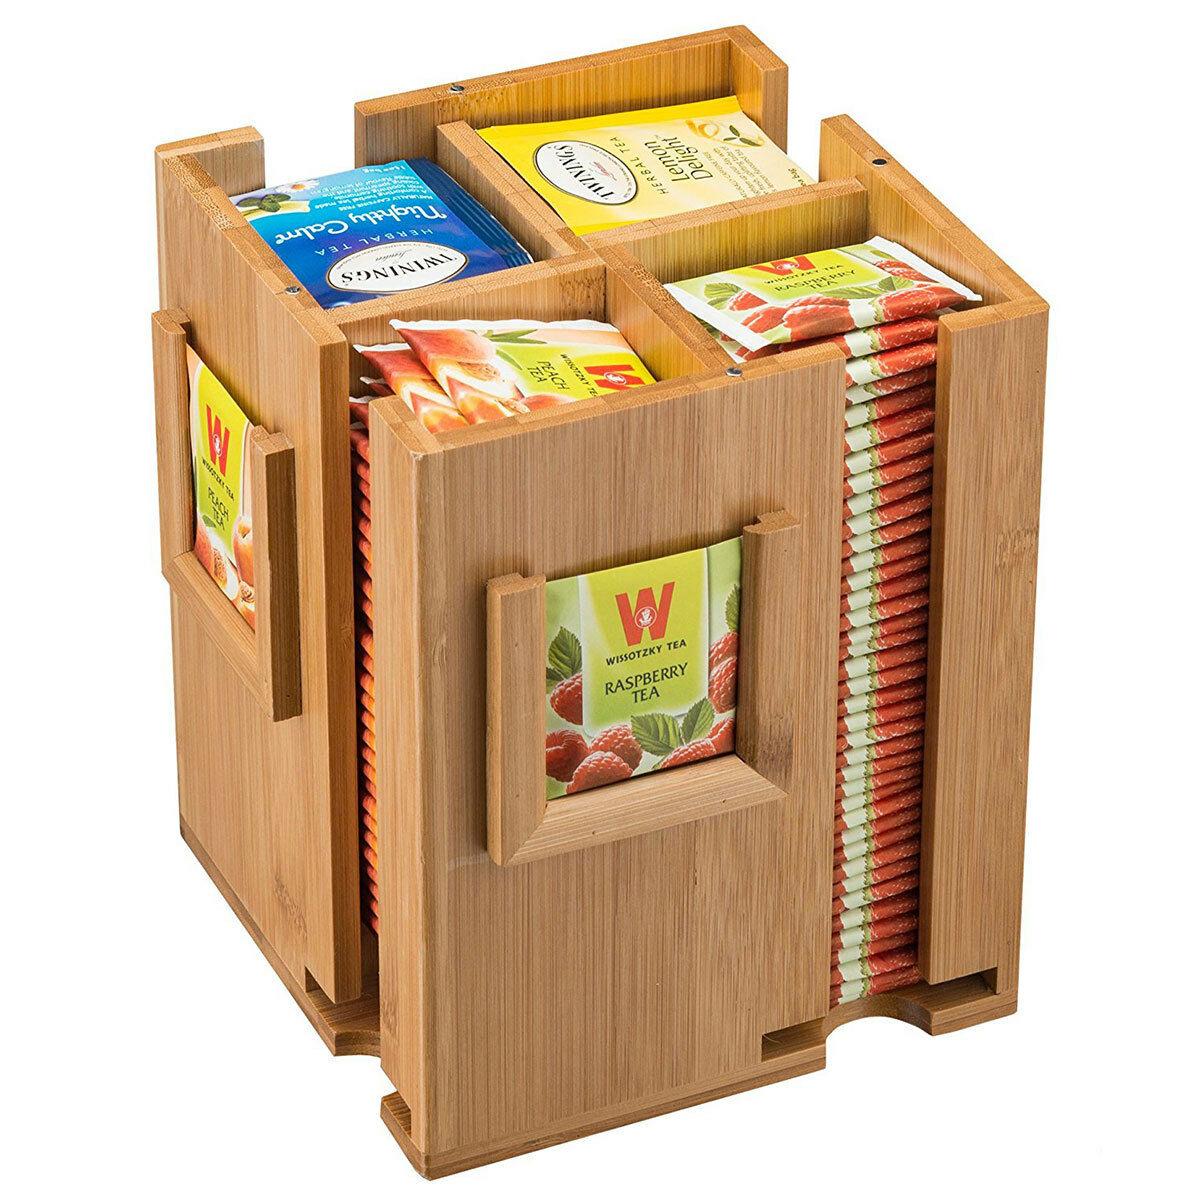 Tea Box Storage Sugar Bag Organizer Free CDR Vectors Art